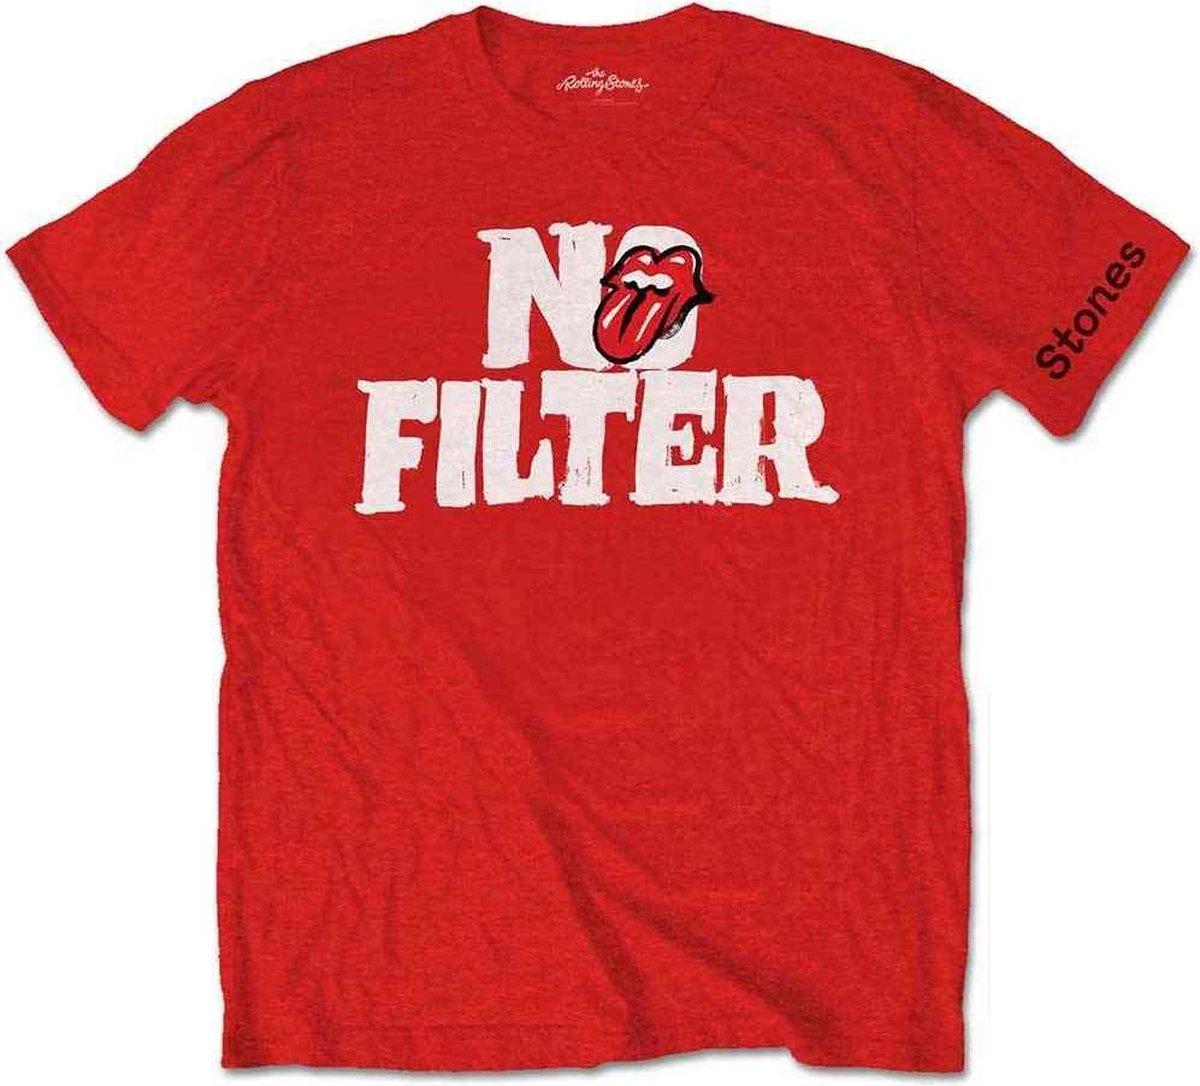 Rolling Stones Heren Tshirt -XL- No Filter Header Logo Rood